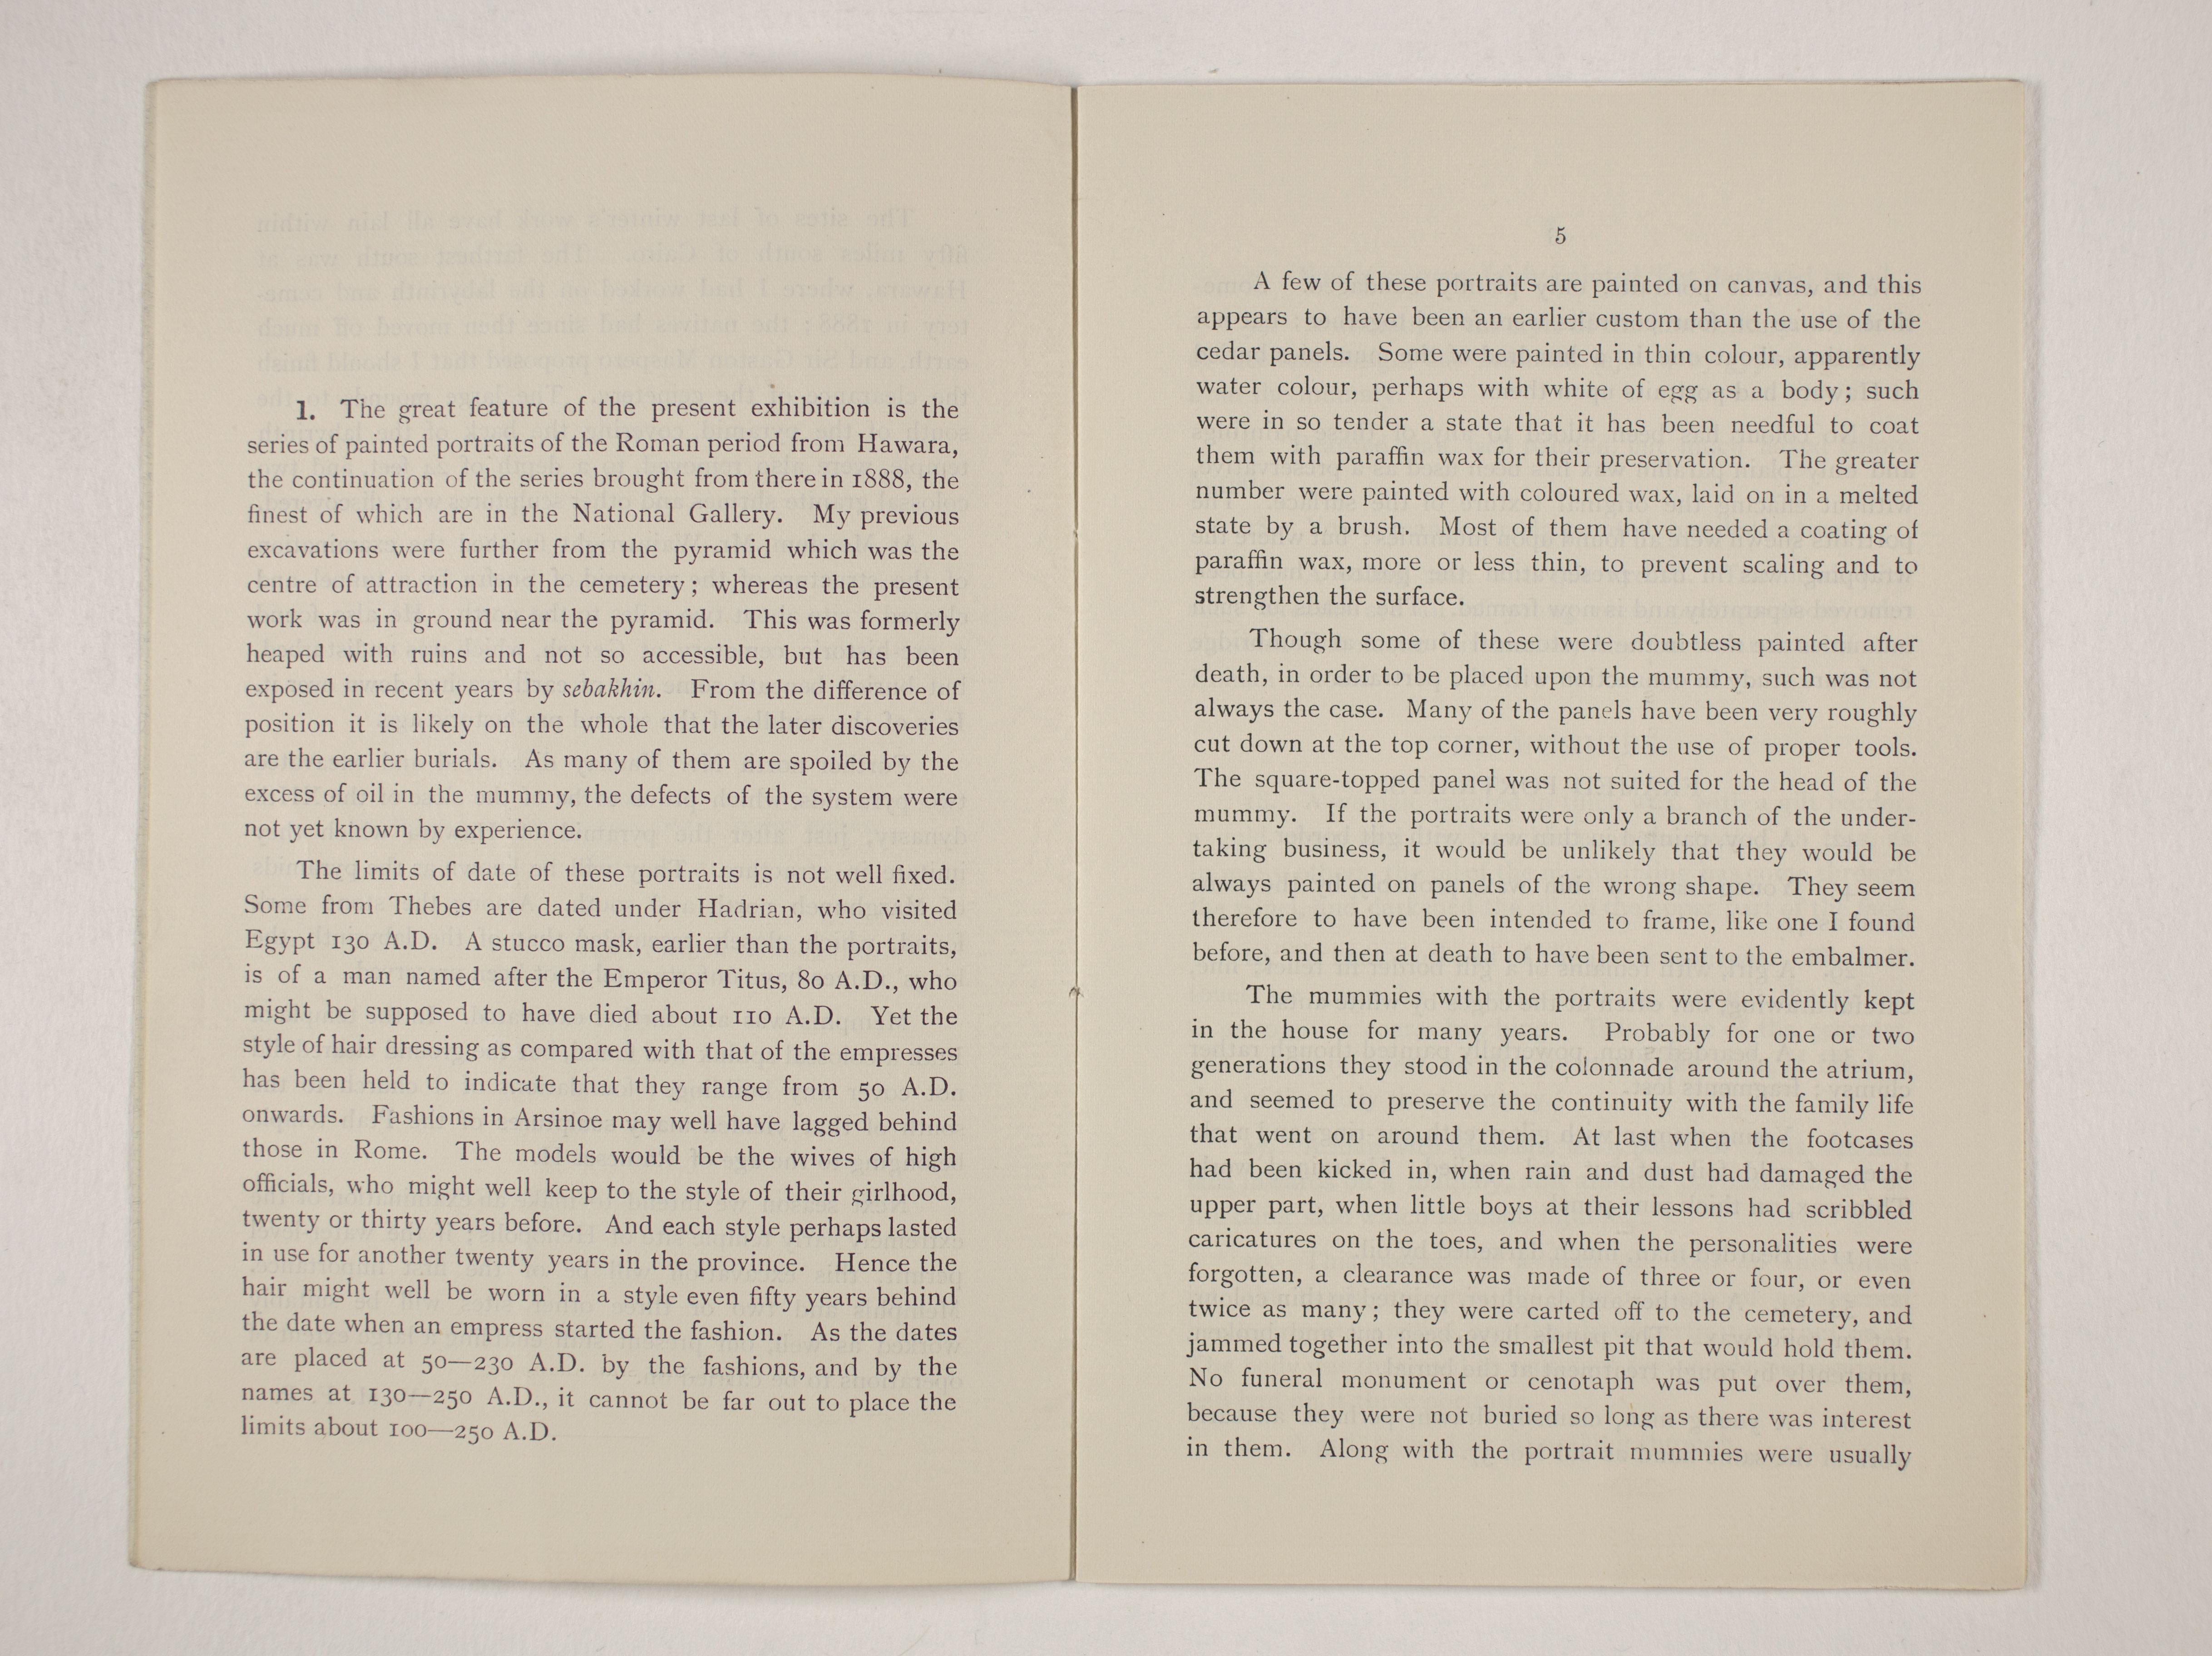 1910-11 Hawara, Gerzeh, Memphis, Mazghuneh Exhibition catalogue PMA/WFP1/D/19/35.4